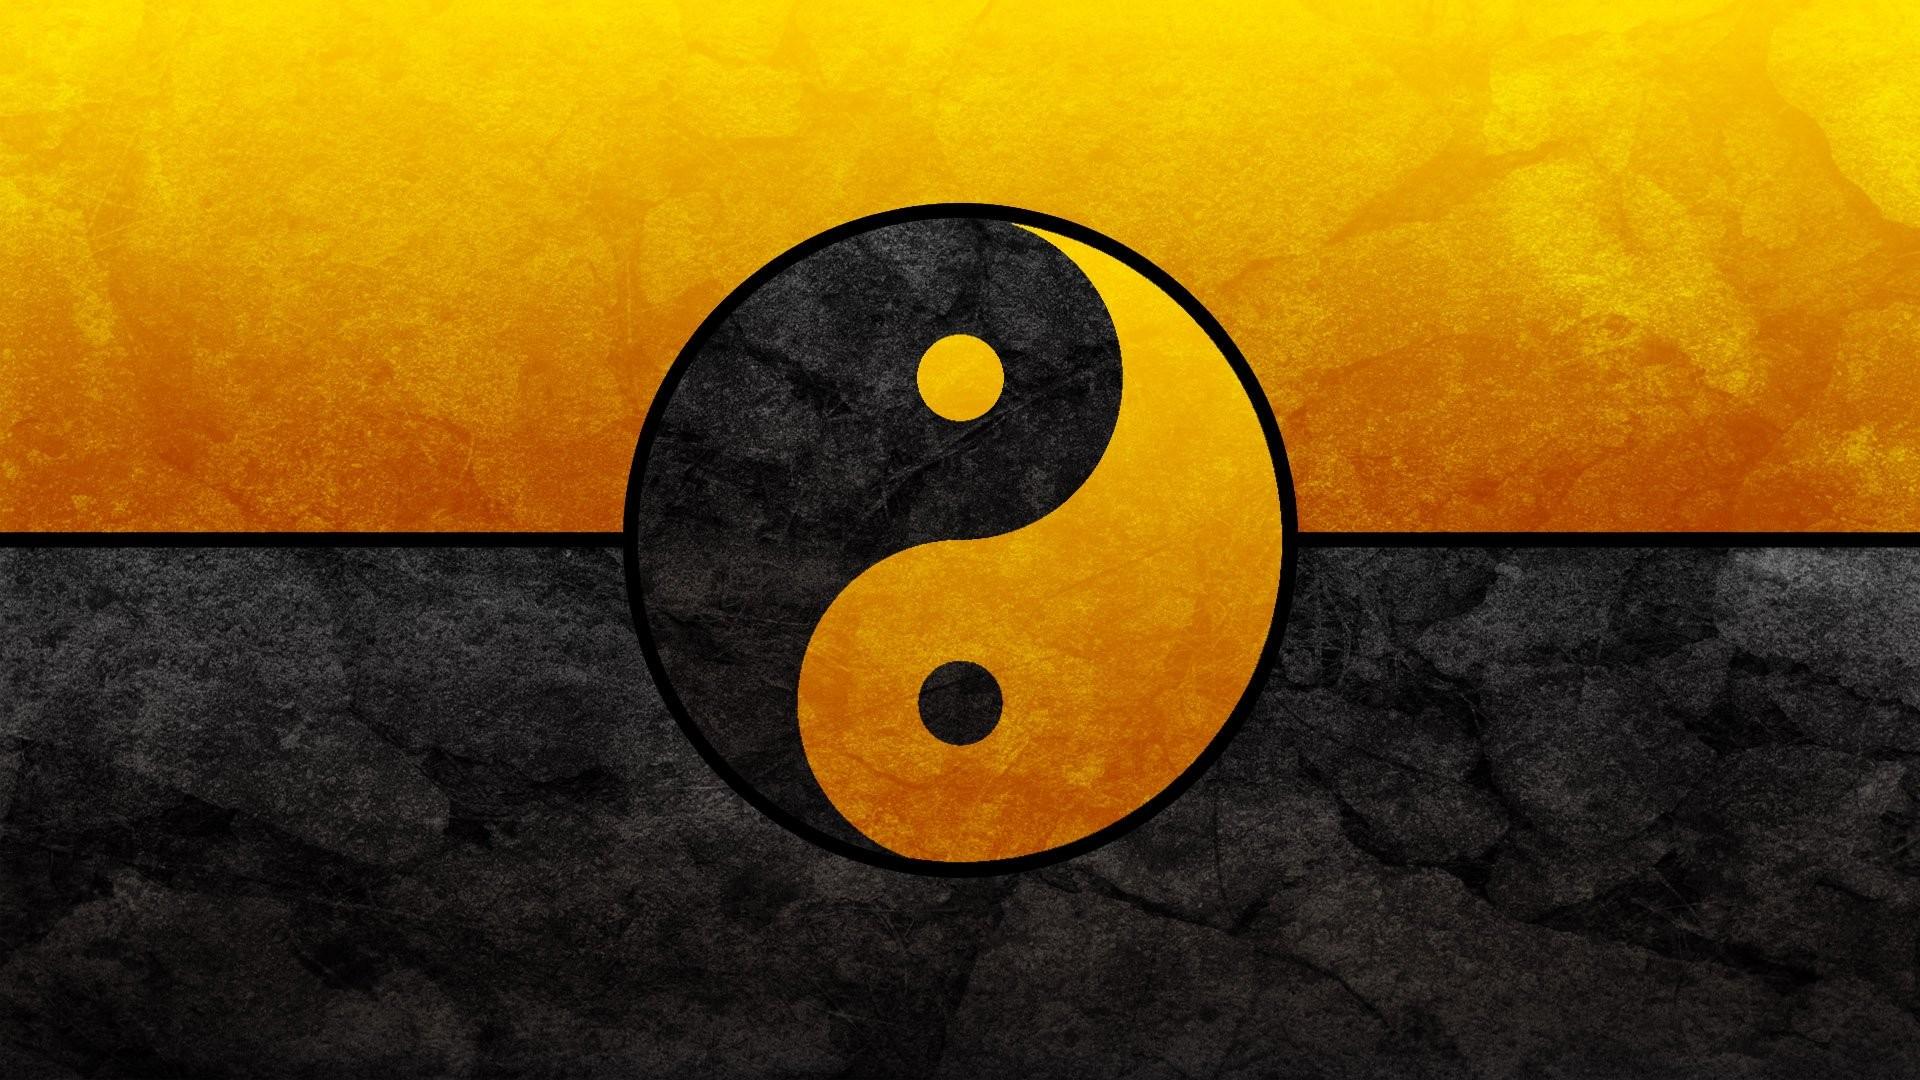 yin yang wallpaper ·① download free amazing backgrounds